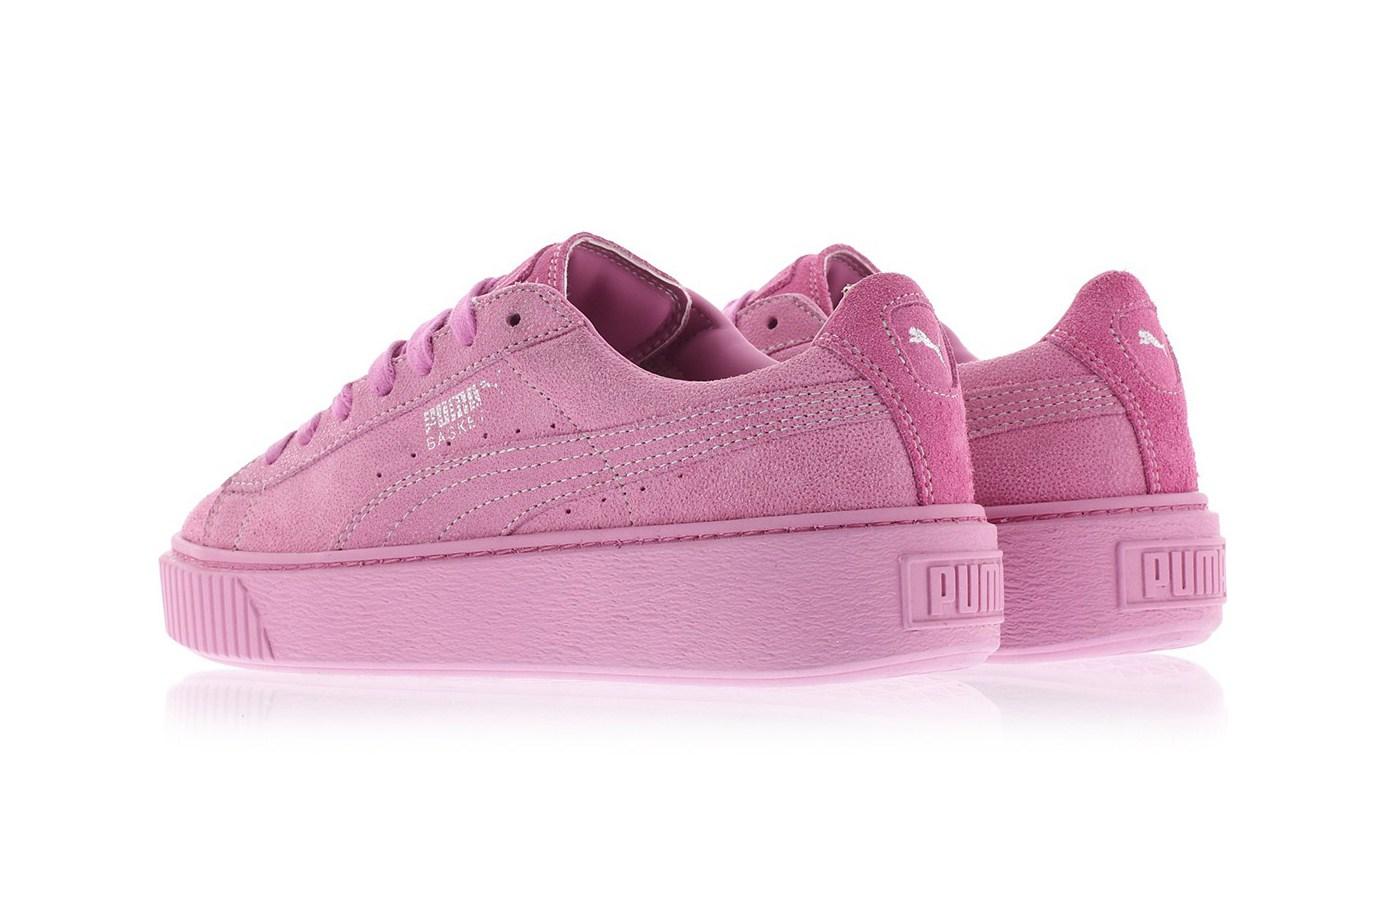 puma-basket-platform-reset-pink-gray-4